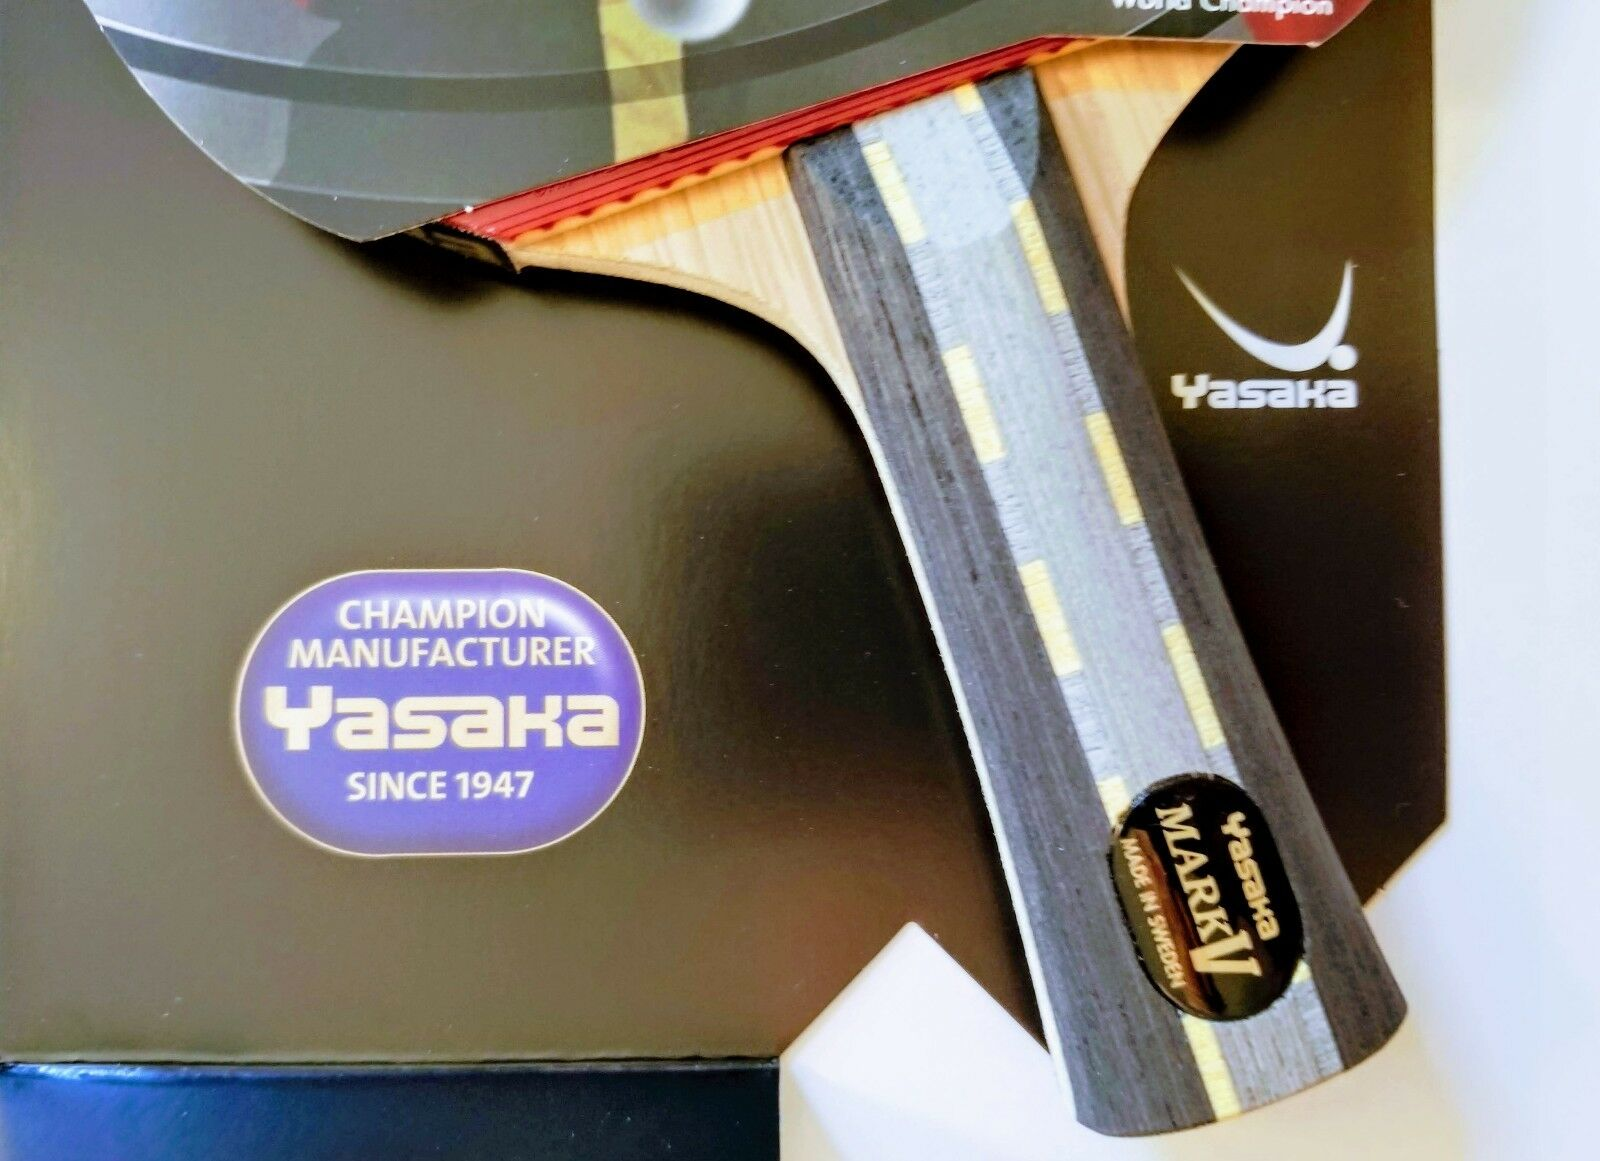 Yasaka MARK V Racket Flared Handle FL Champion Line for Table Tennis